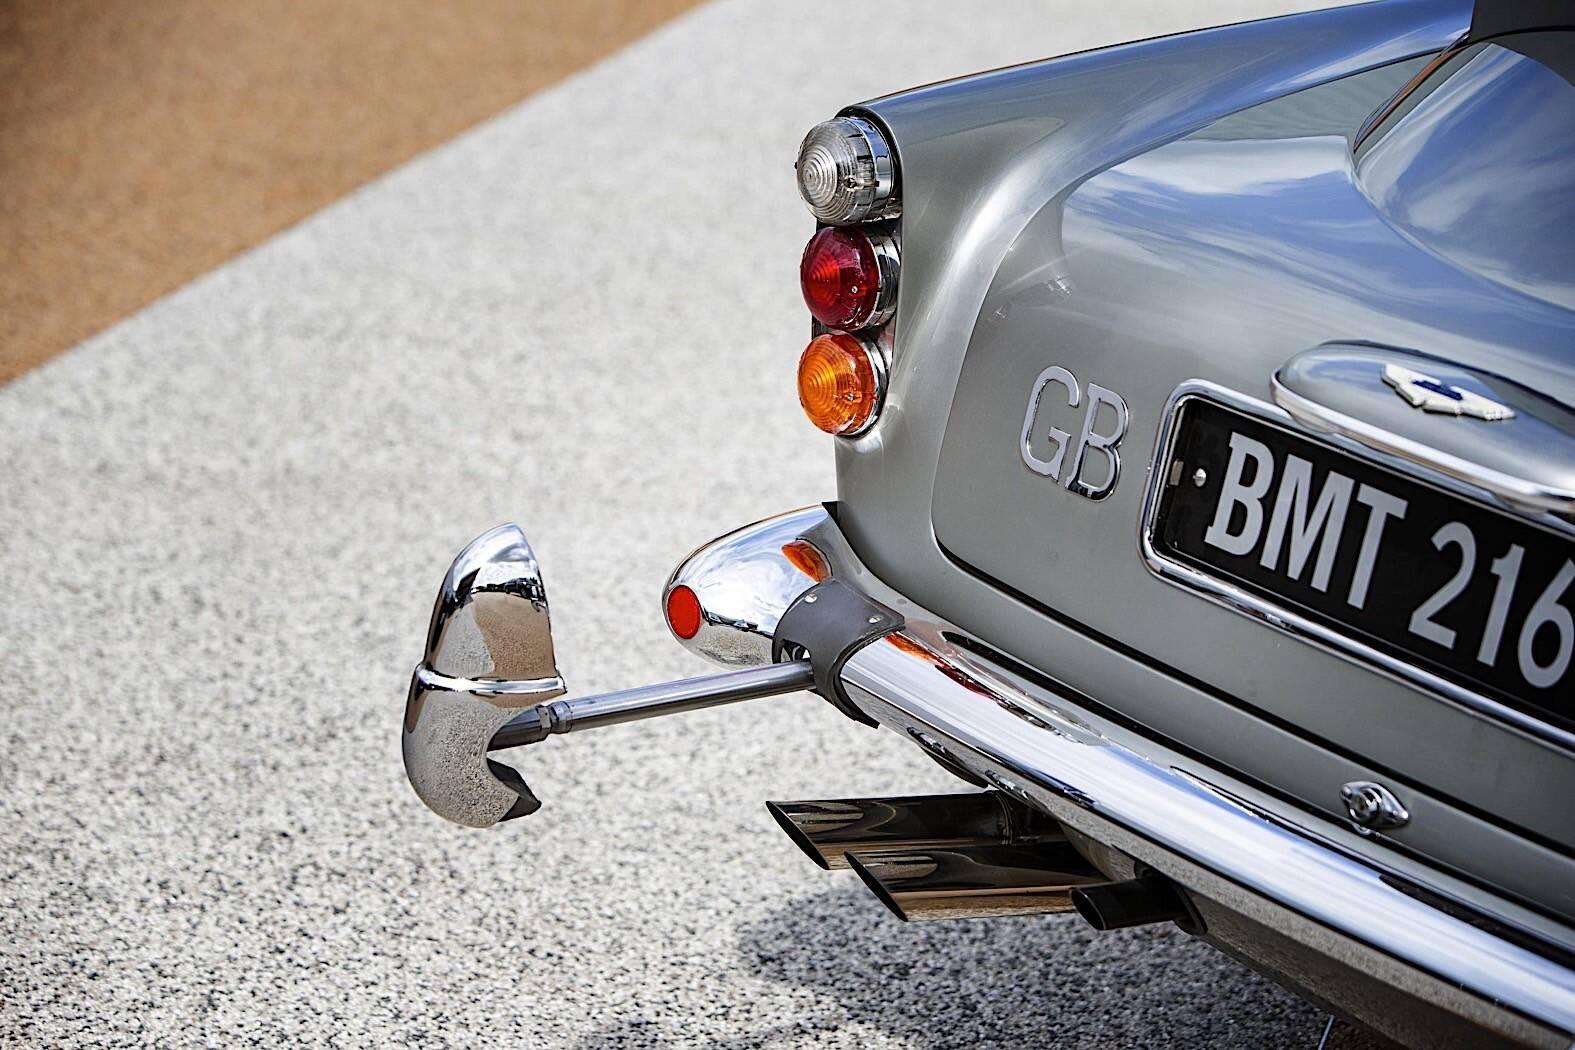 Aston Martin DB5 007 Thunderball. Foto: Divulgação